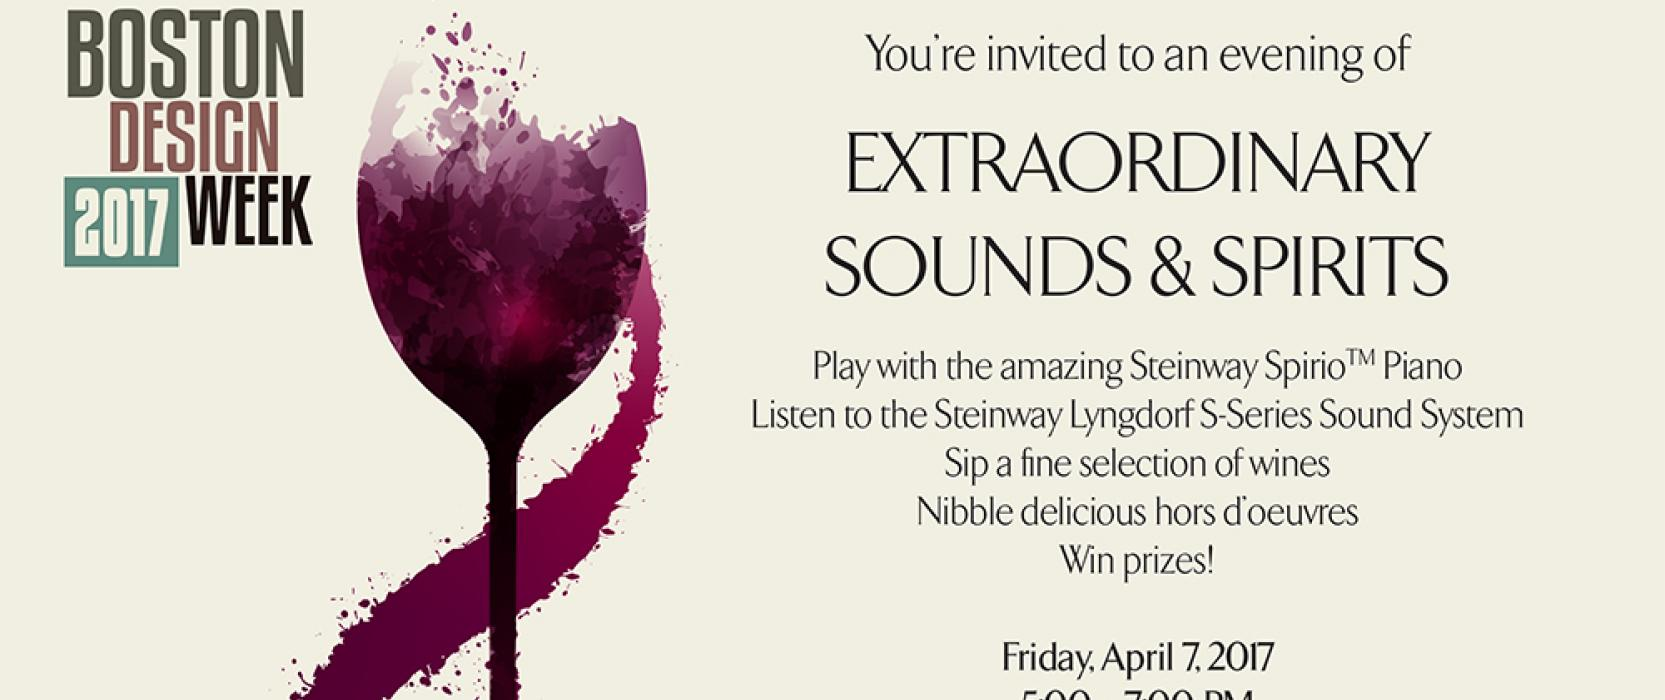 Steinway Spirio Piano, Steinway Lyngdorf S-Series Sound System, Boston Design Week, Audio Video Design, M. Steinhart & Sons, Boston Design Guide